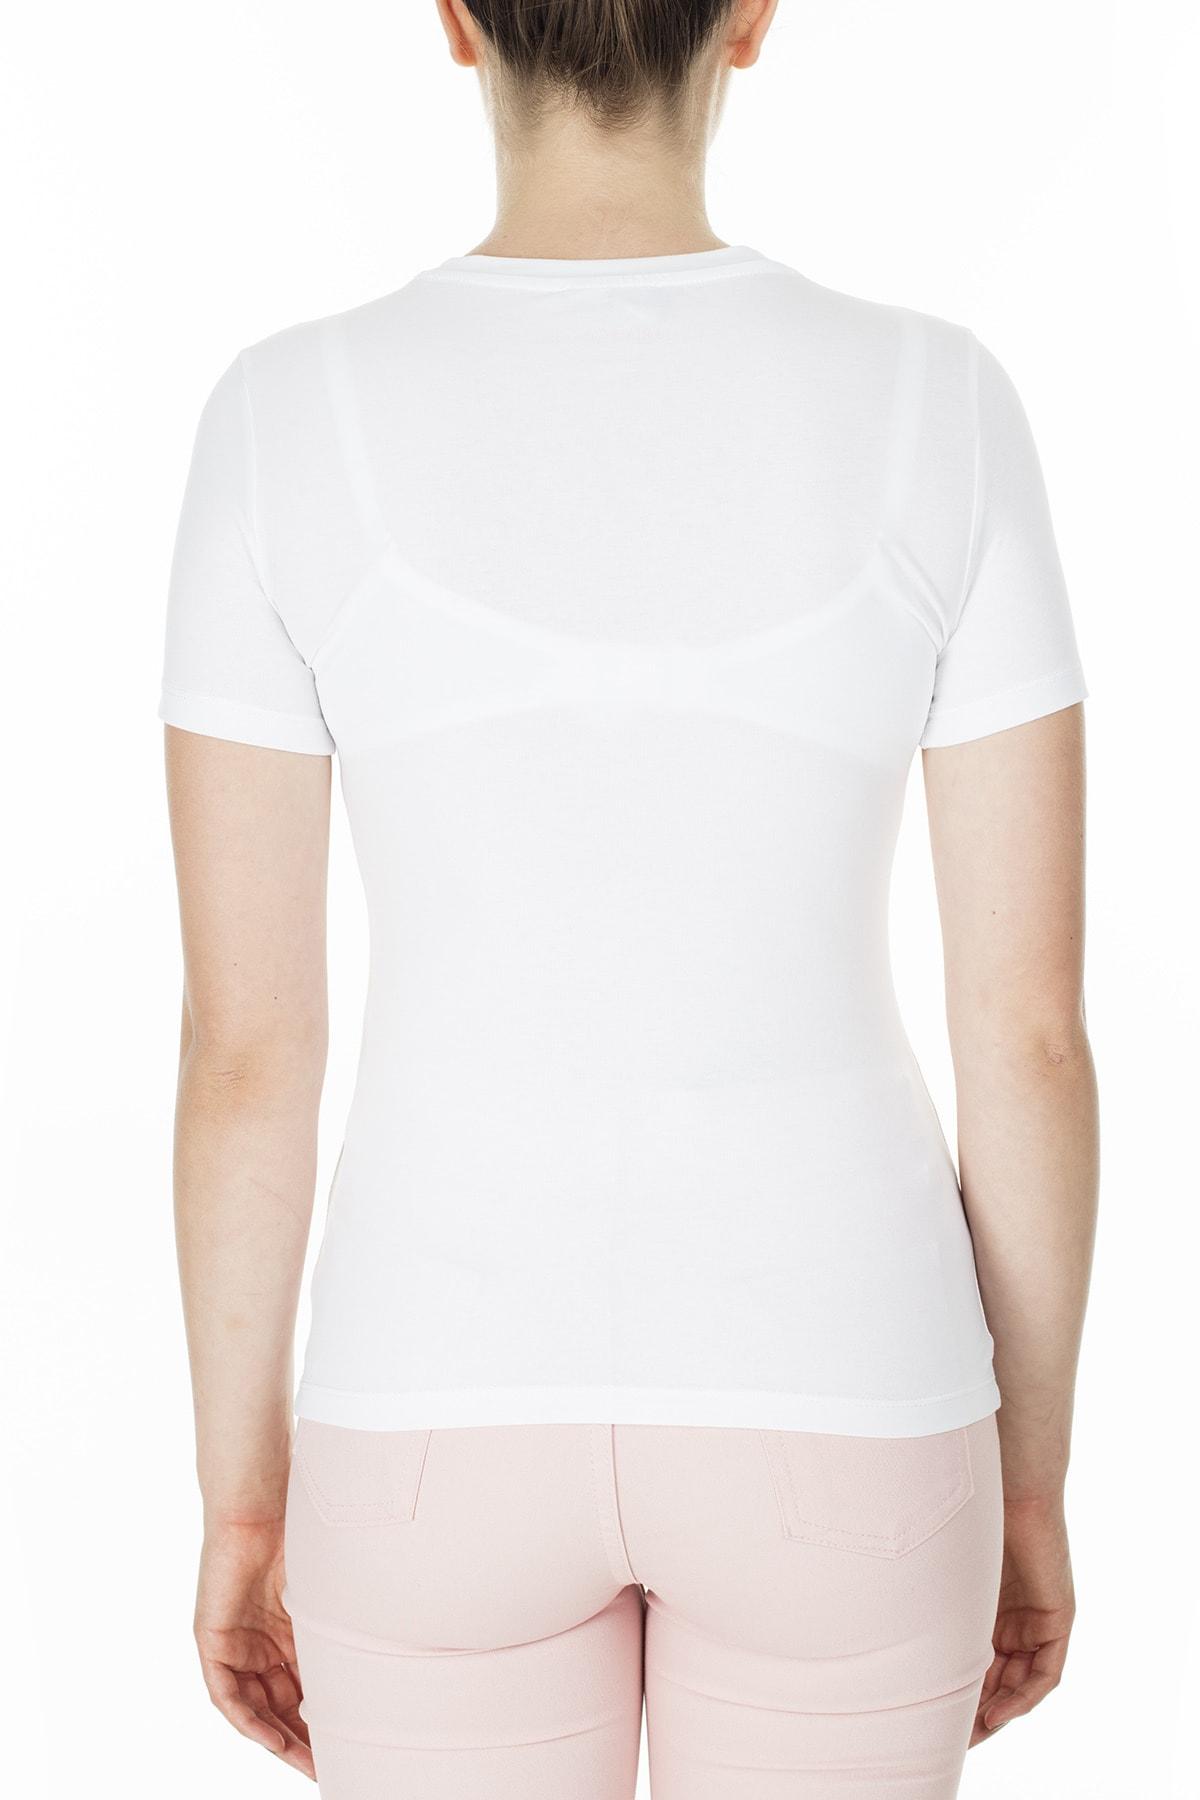 Emporio Armani Kadın Beyaz T-Shirt 3H2T8A 2J07Z 0100 2